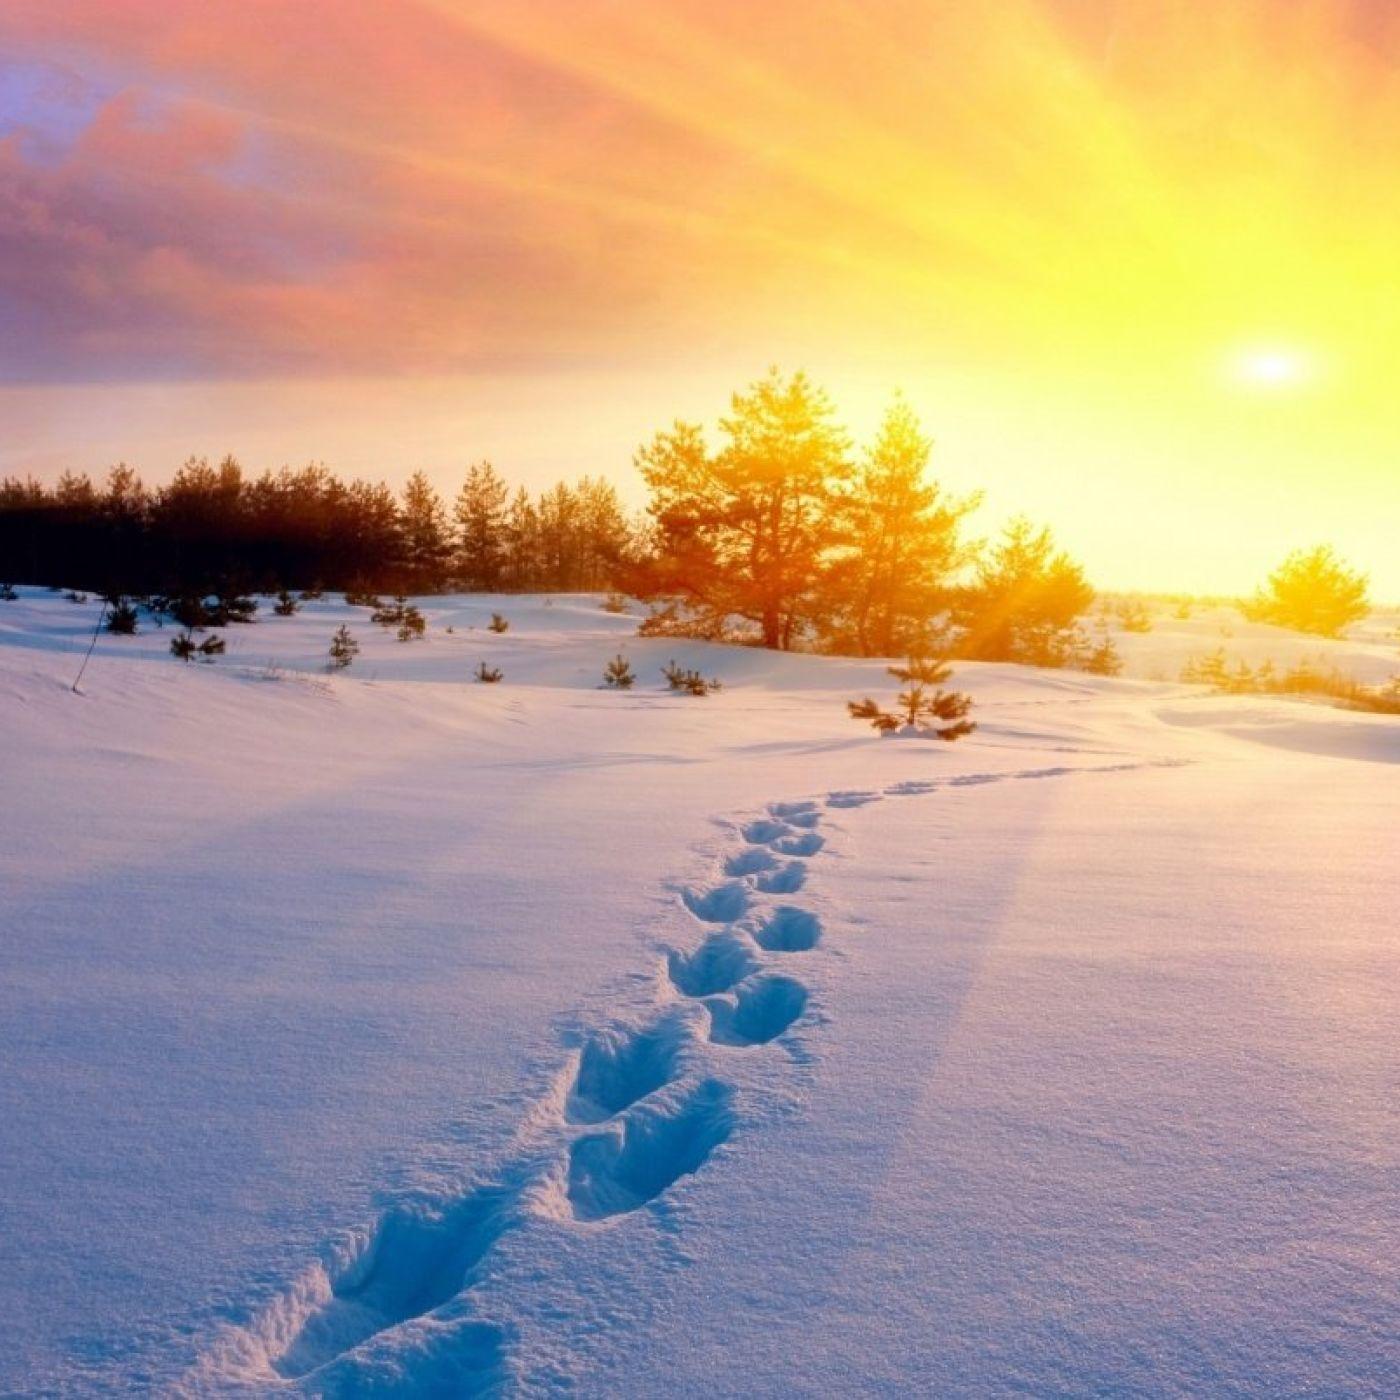 Walking in Snow (ASMR / Sounds)